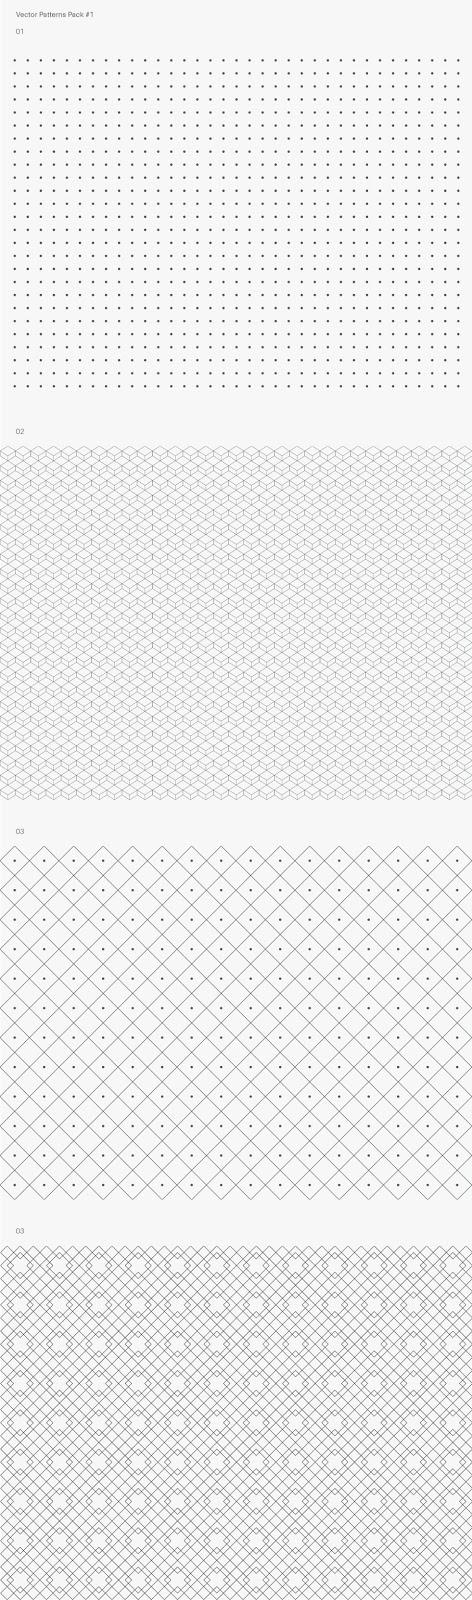 Seamles Pattern Vector Pack Sample - psdoc id